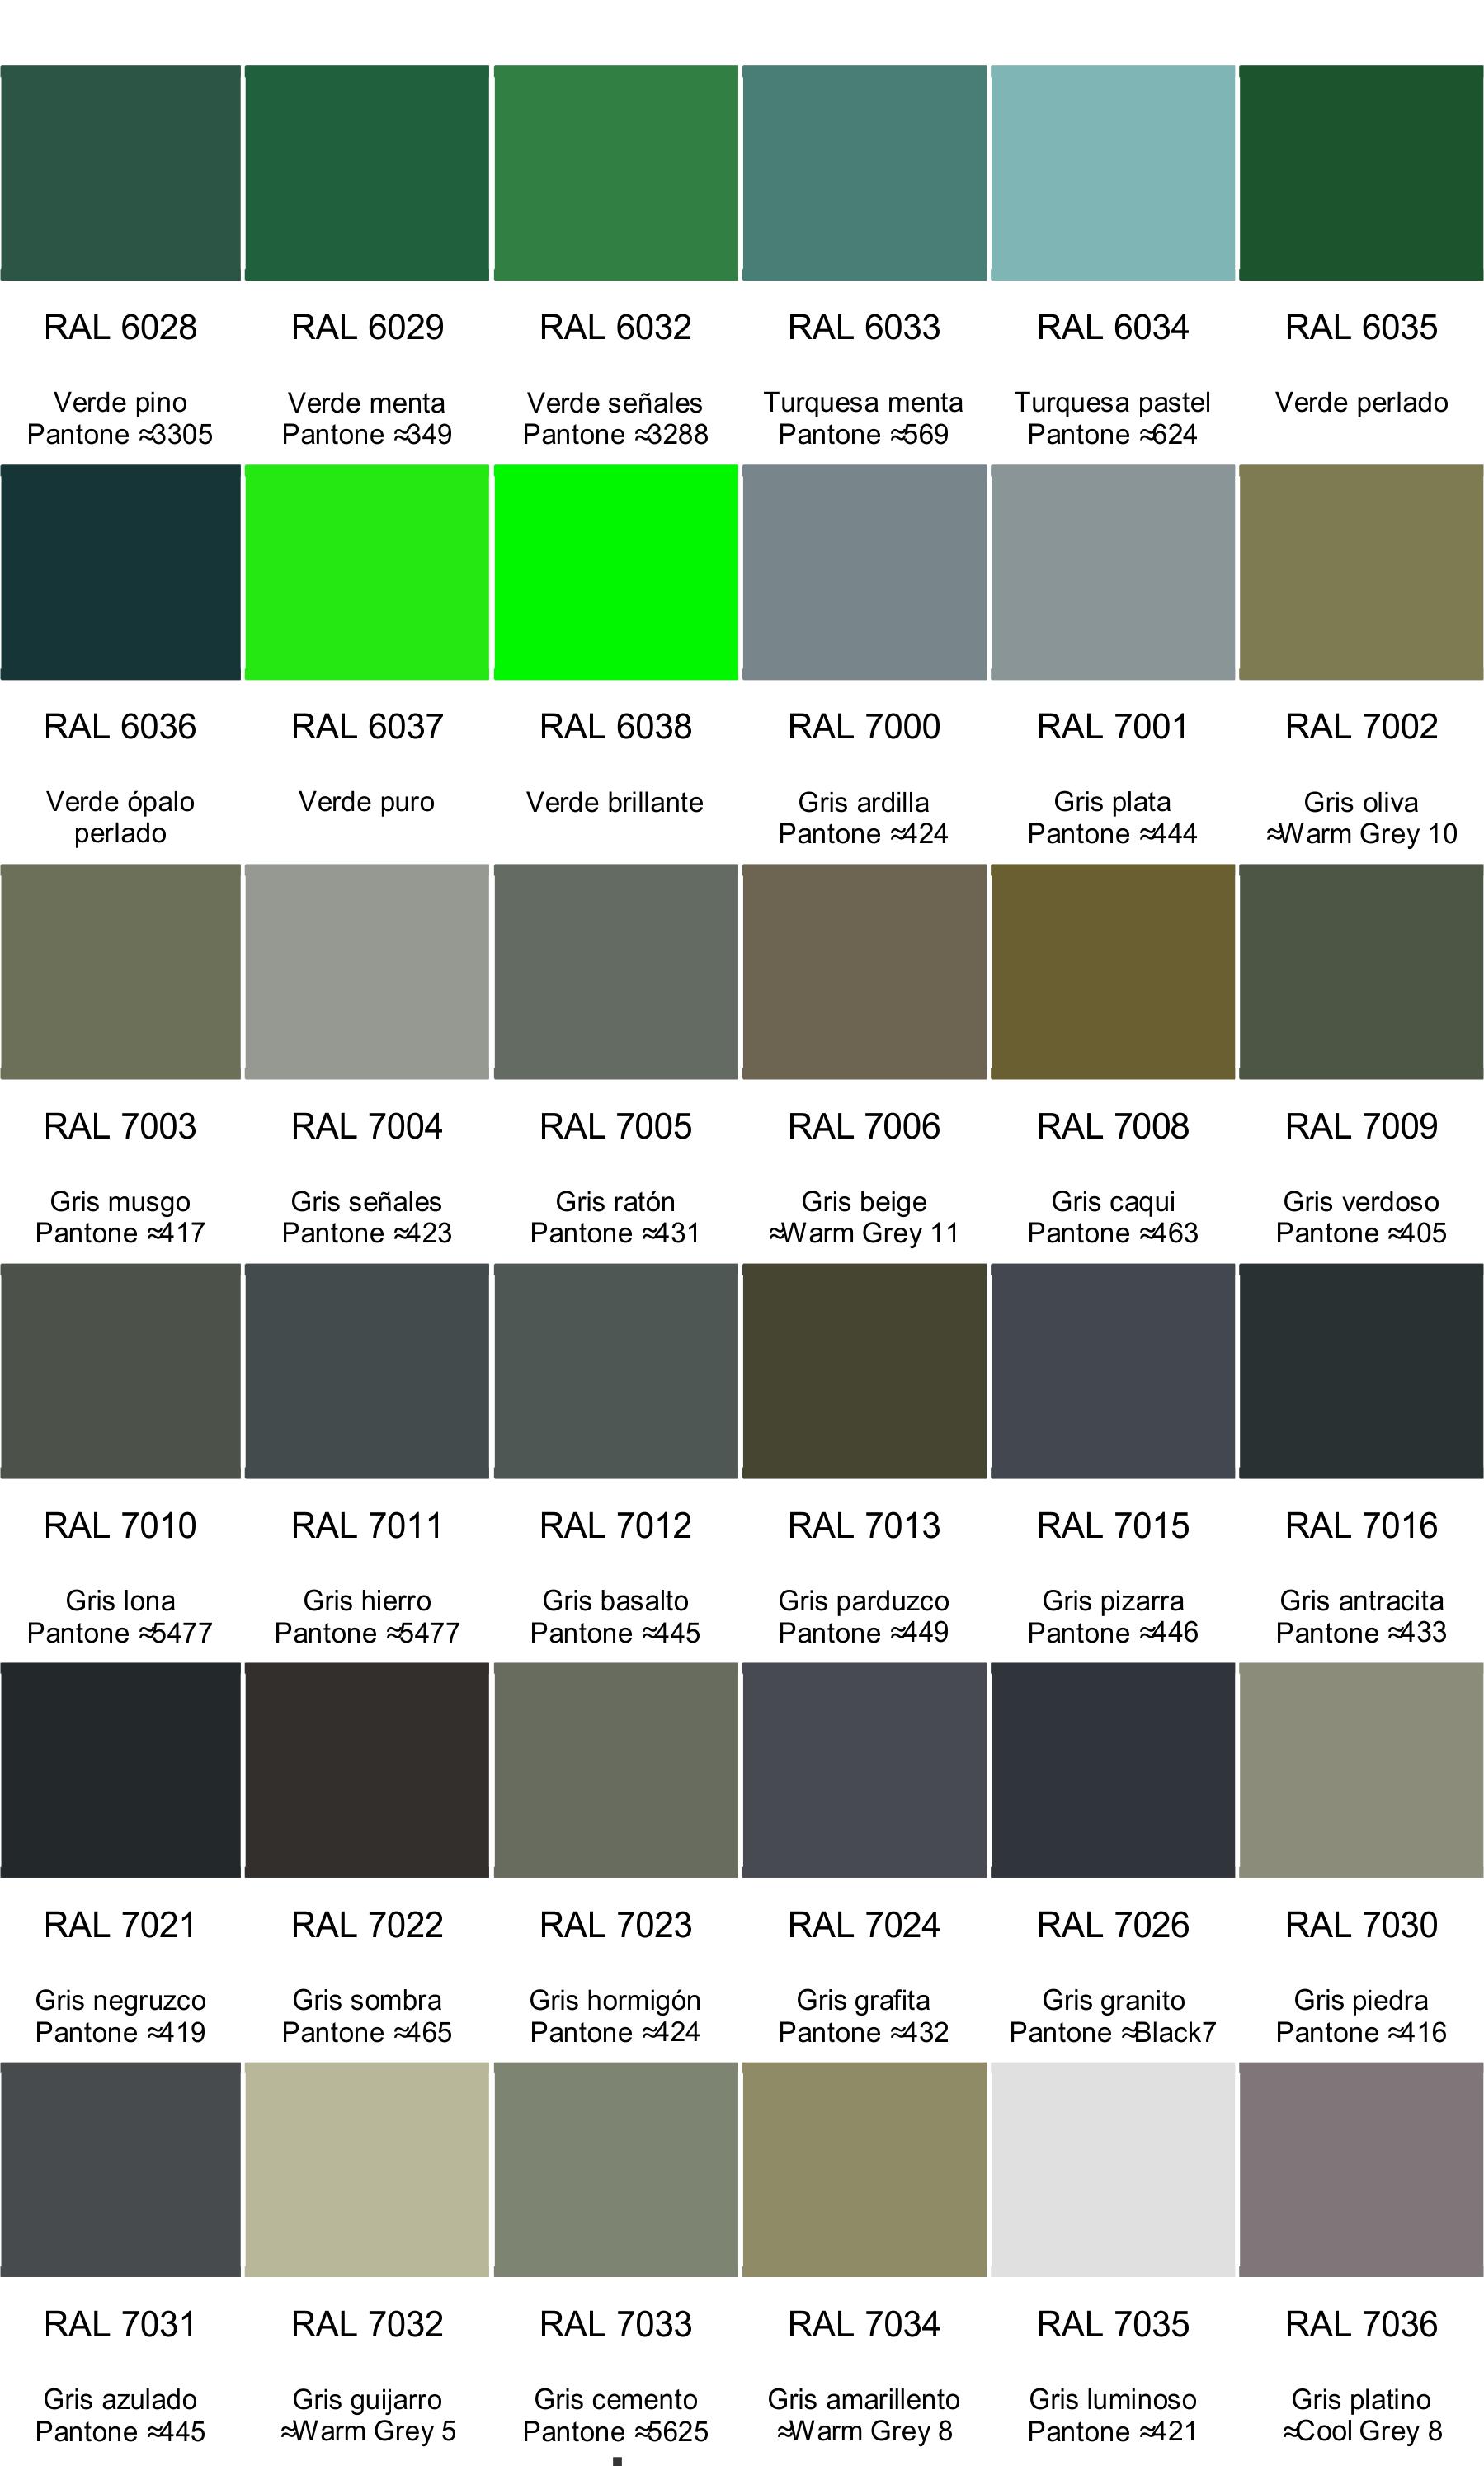 Colores ral pinar sa carta de colores ral en espa ol for Paleta de colores grises